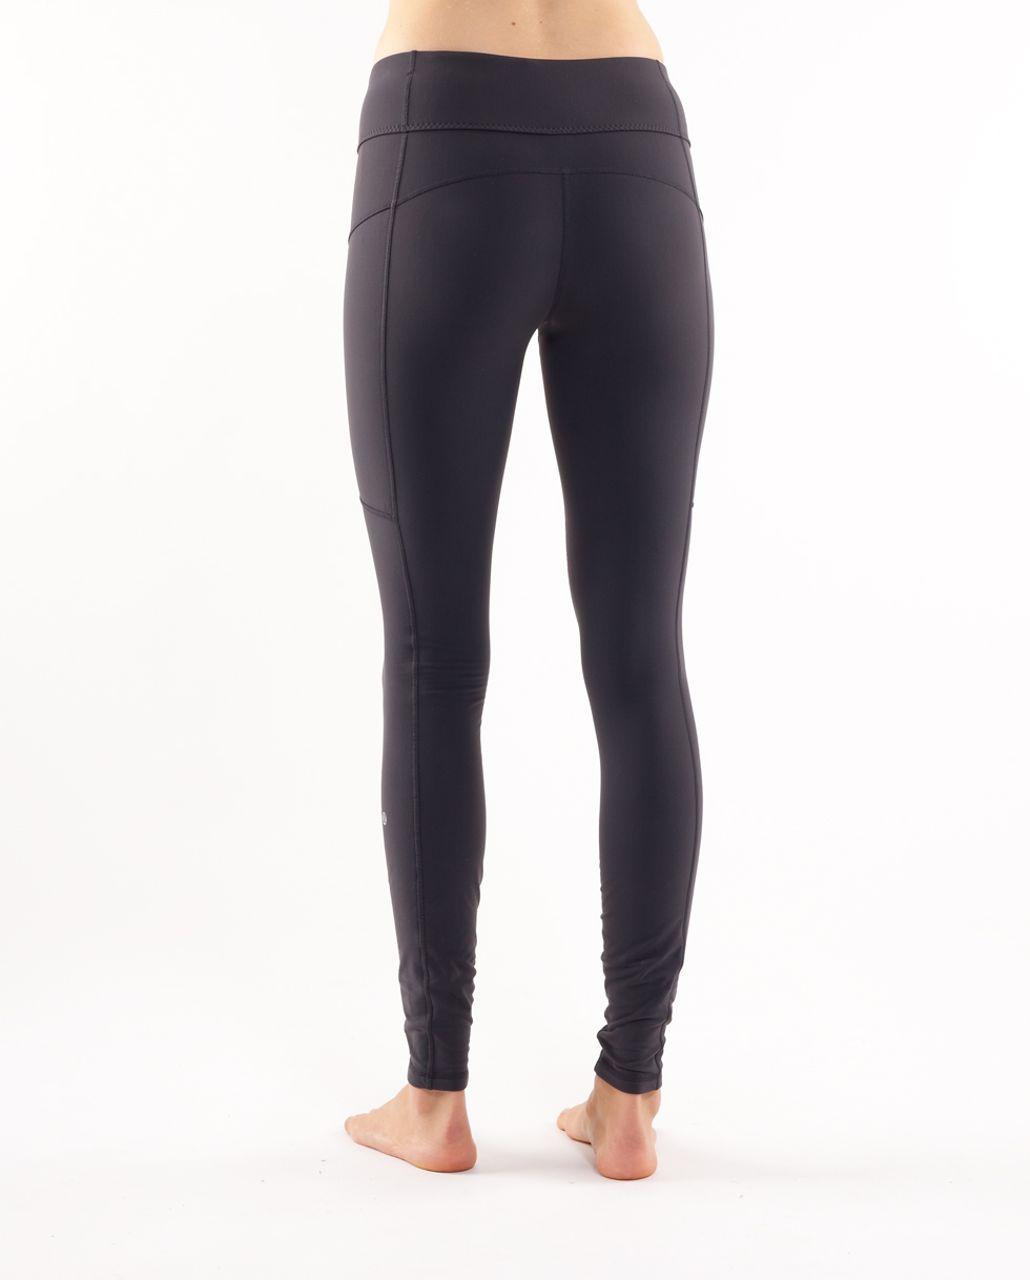 Lululemon Run:  For It Tight - Deep Coal /  White Heathered Blurred Grey Classic Stripe